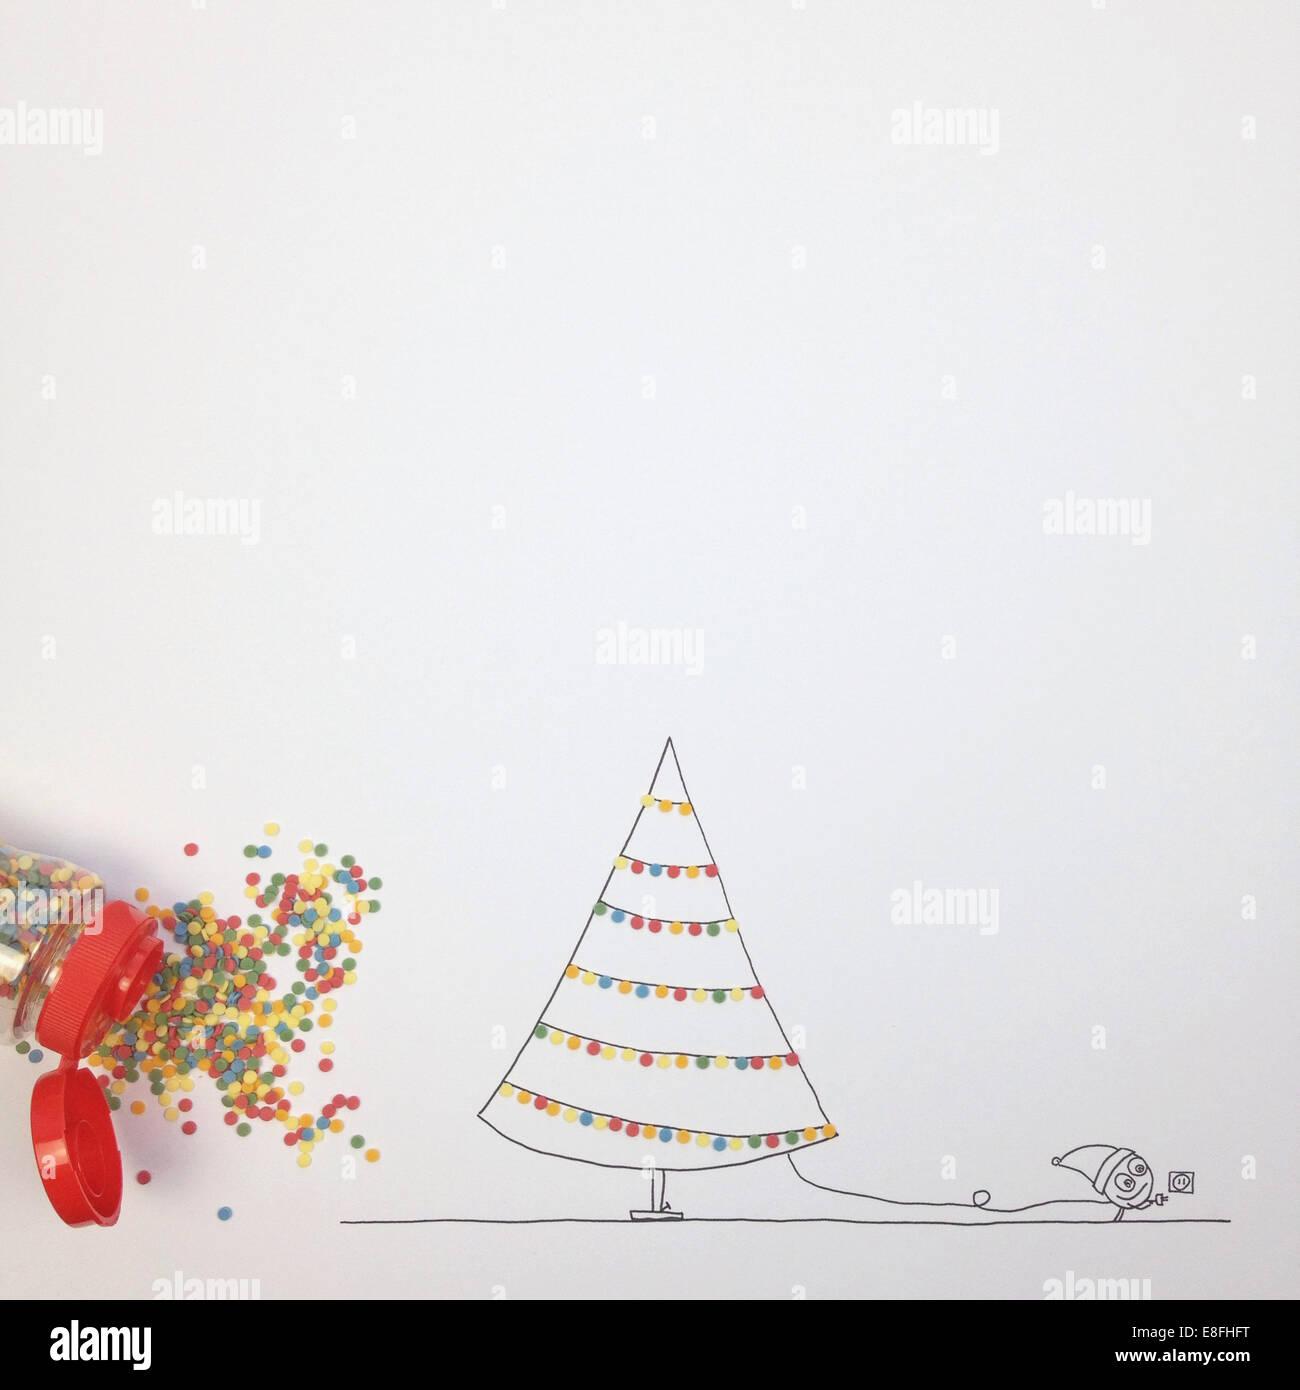 Caractère fantaisie conceptuelle avec Christmas fairy lights Photo Stock